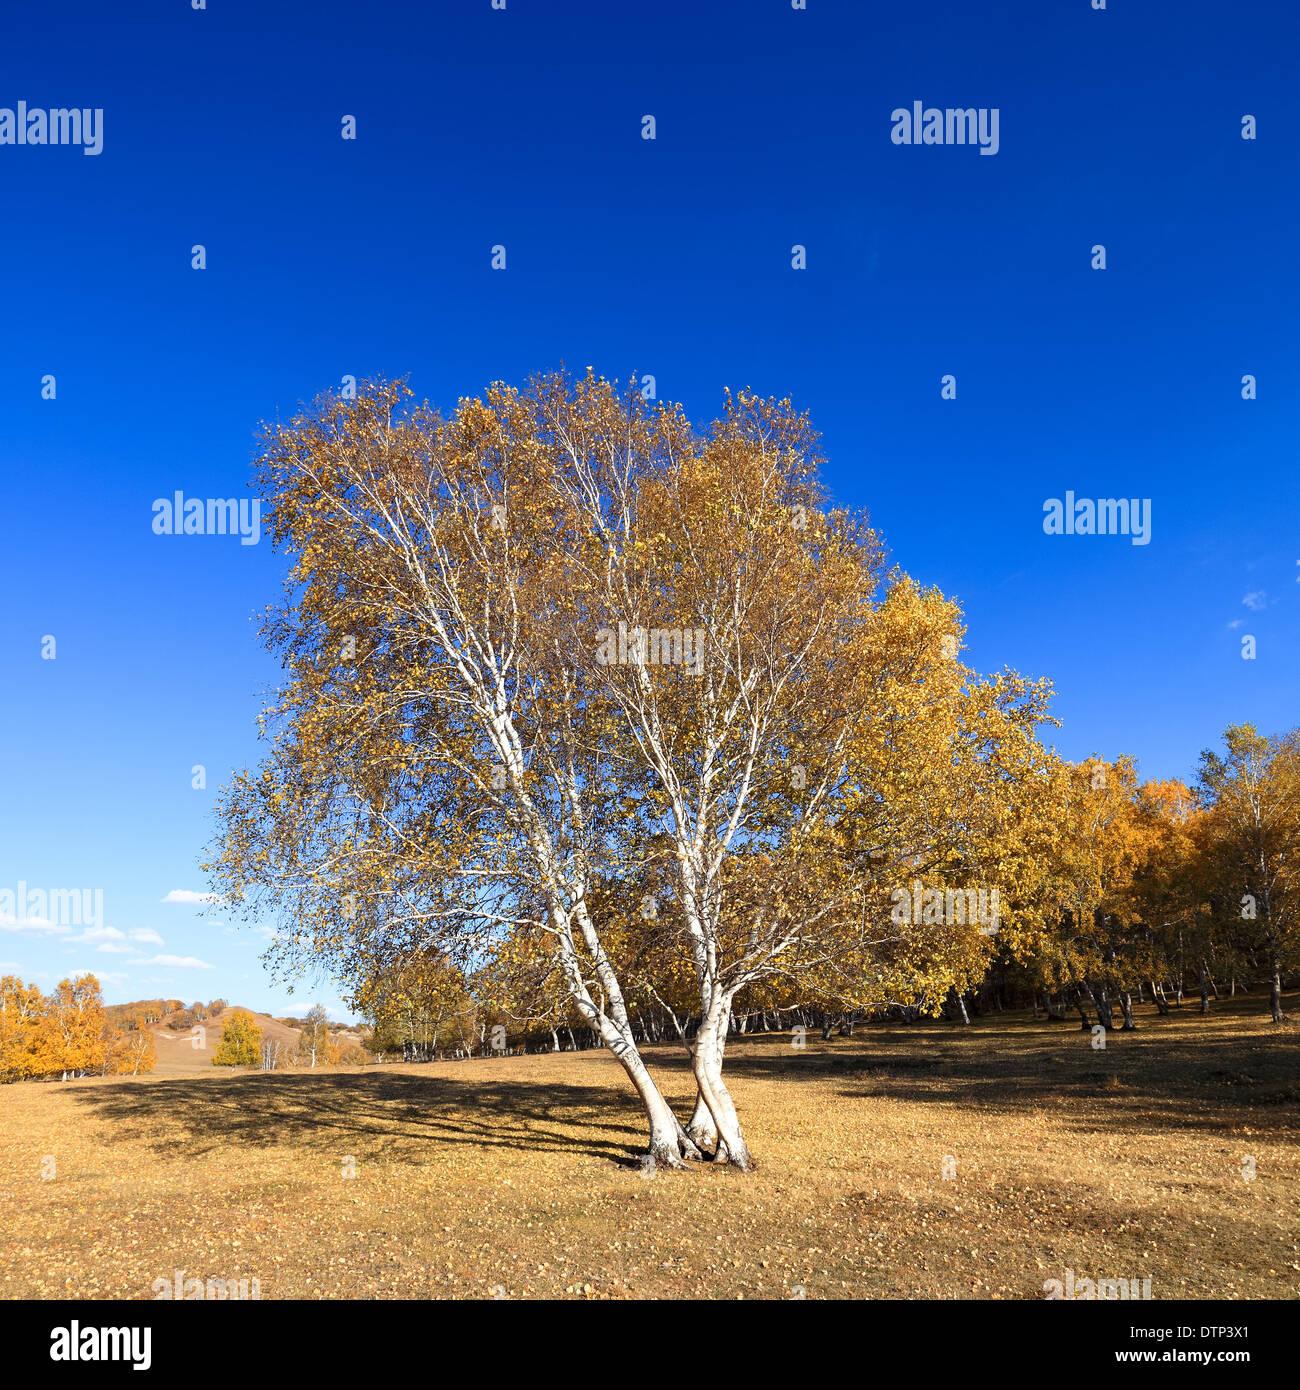 birch trees in autumn - Stock Image